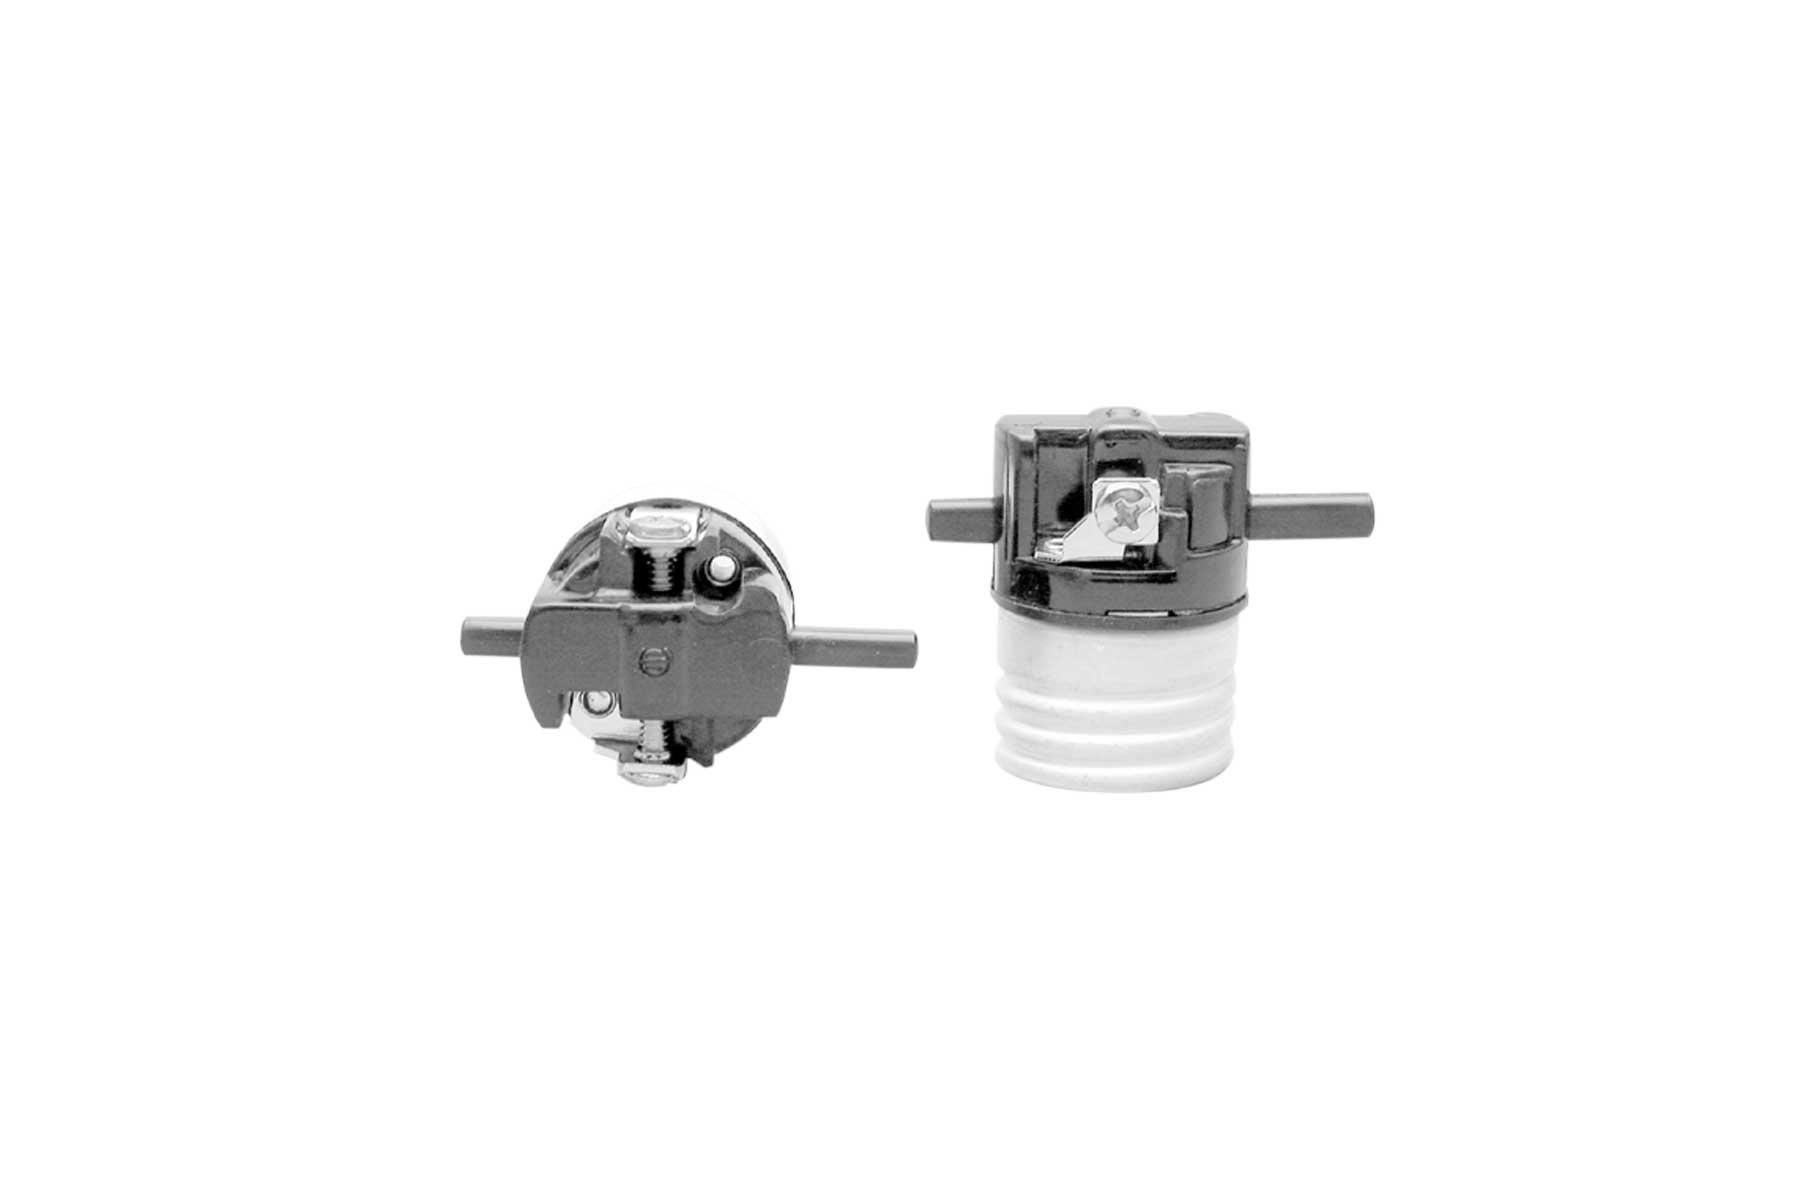 Push Thru Electrolier Screw Terminal for Medium Base Incandescent Light Socket Interior Mechanism